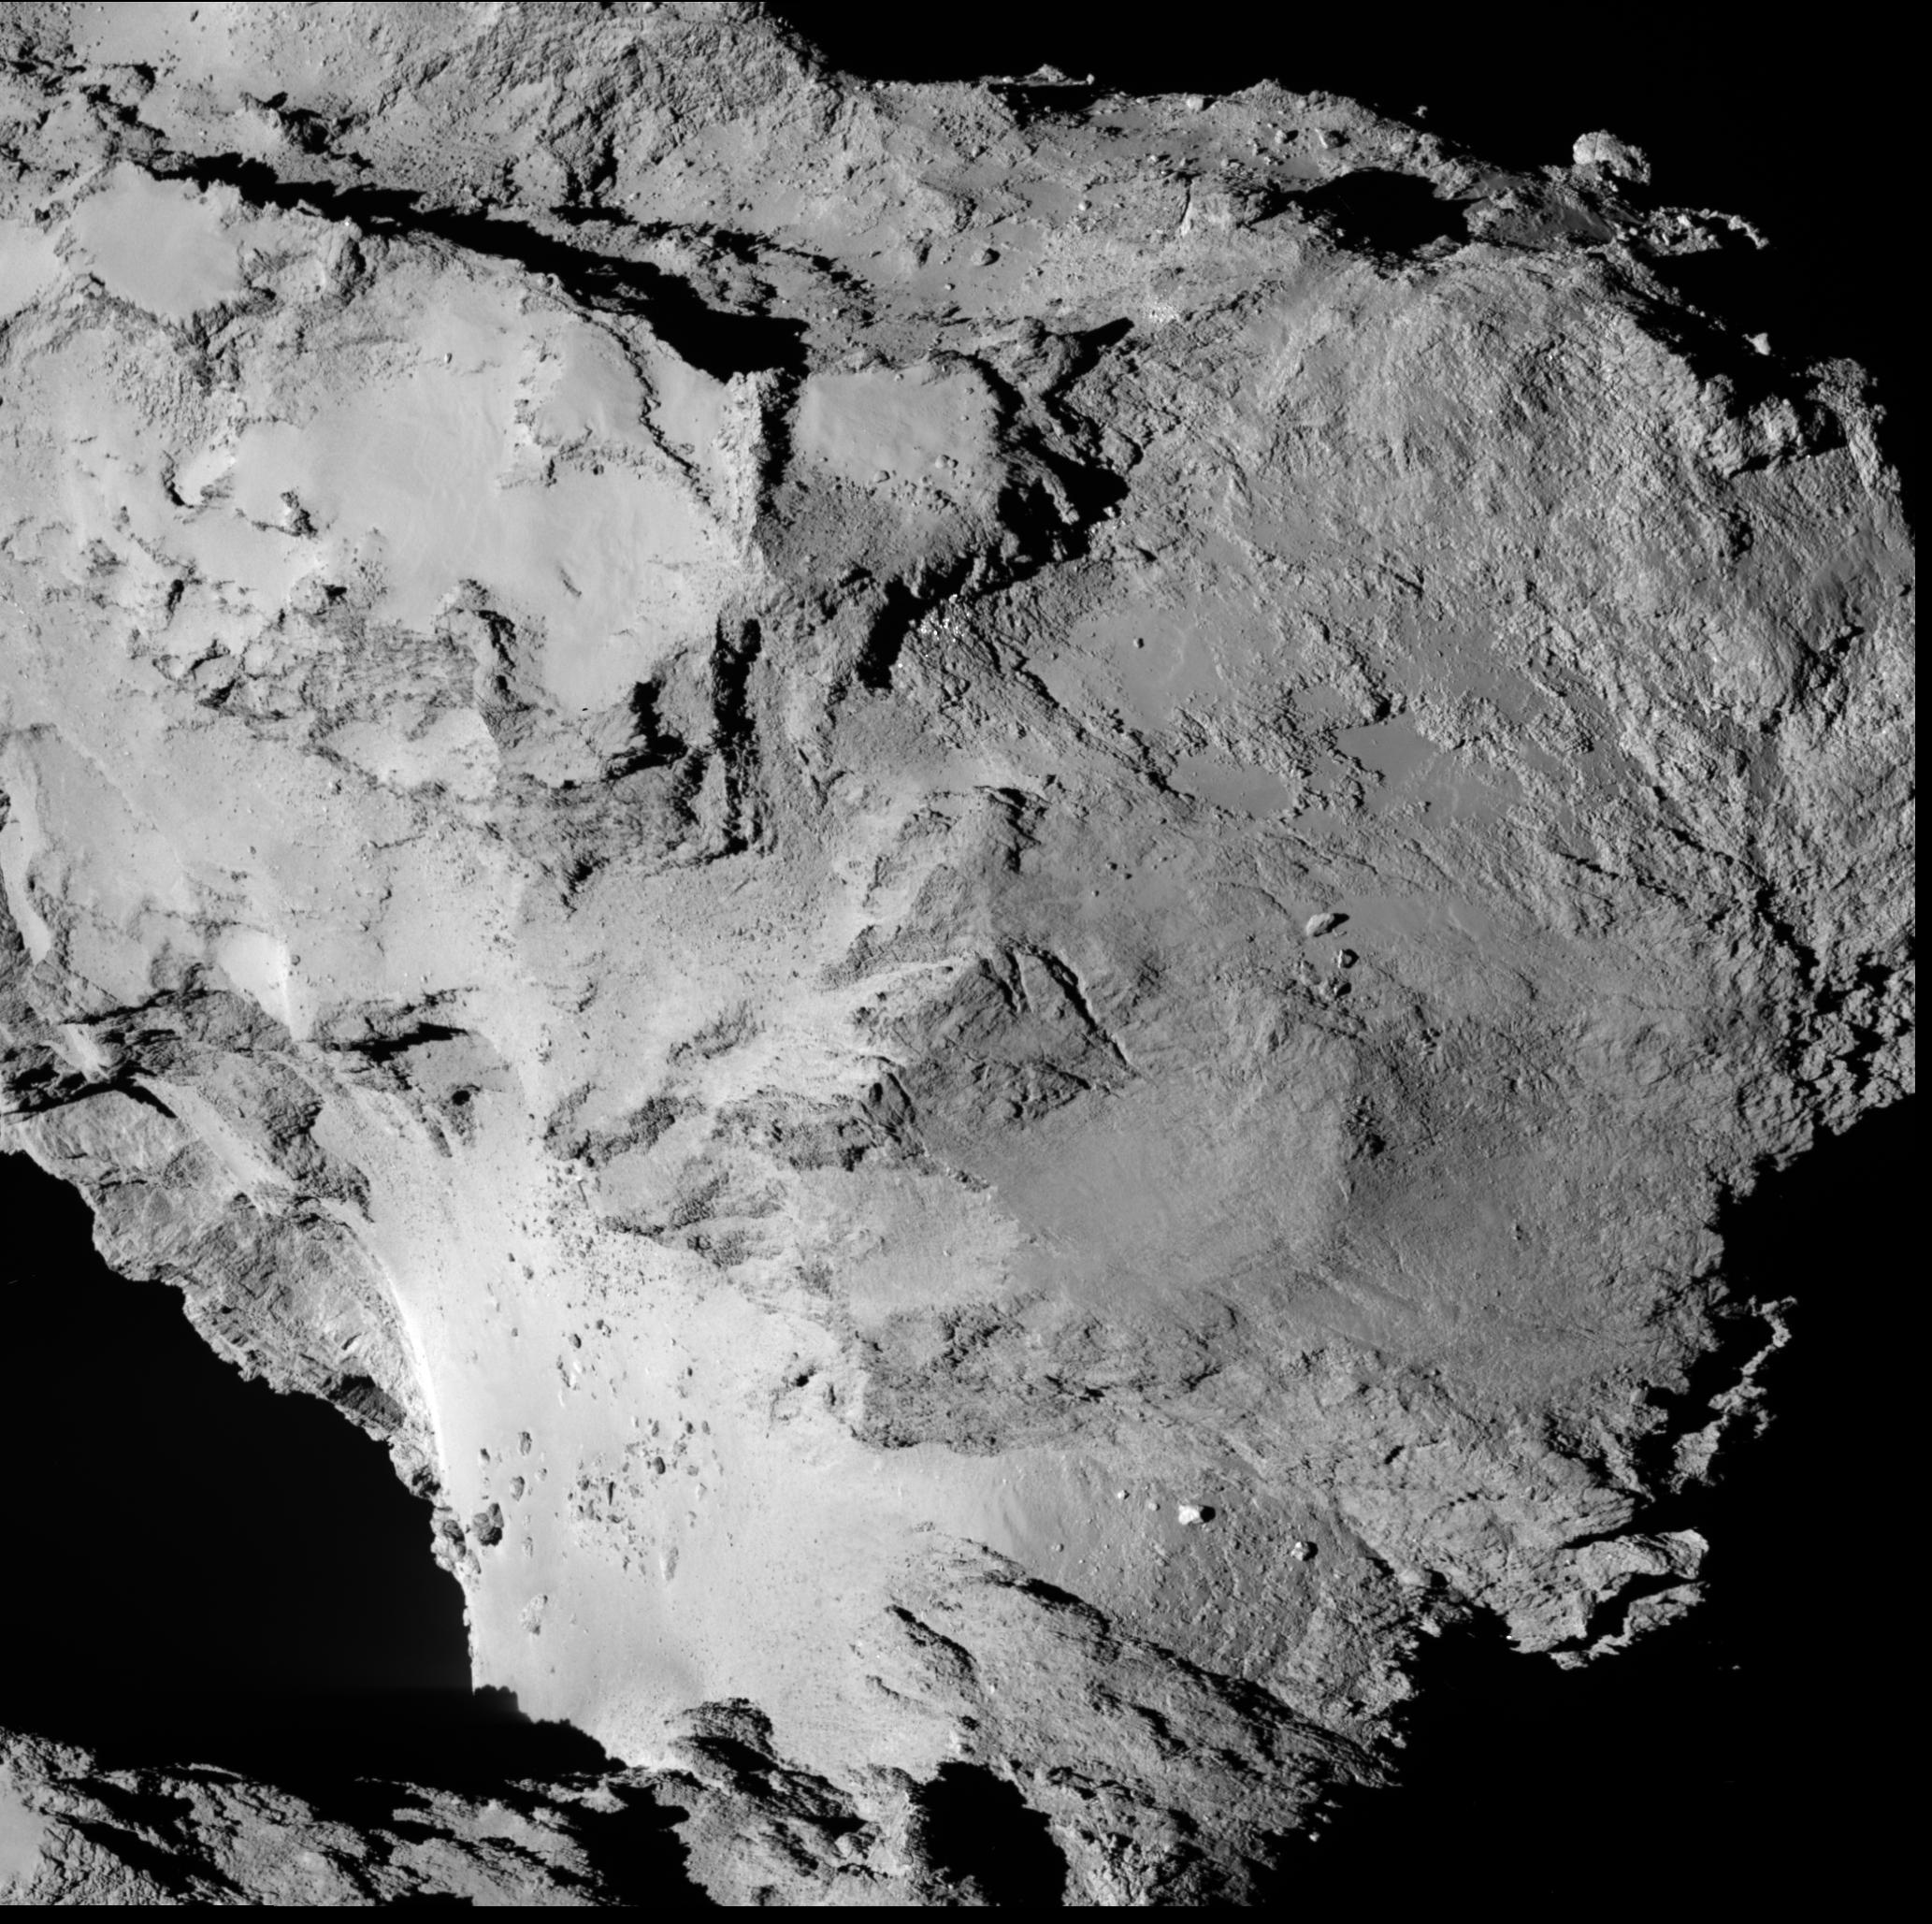 1567215806527-ESA_Rosetta_OSIRIS_Khepry-Aker.jpg